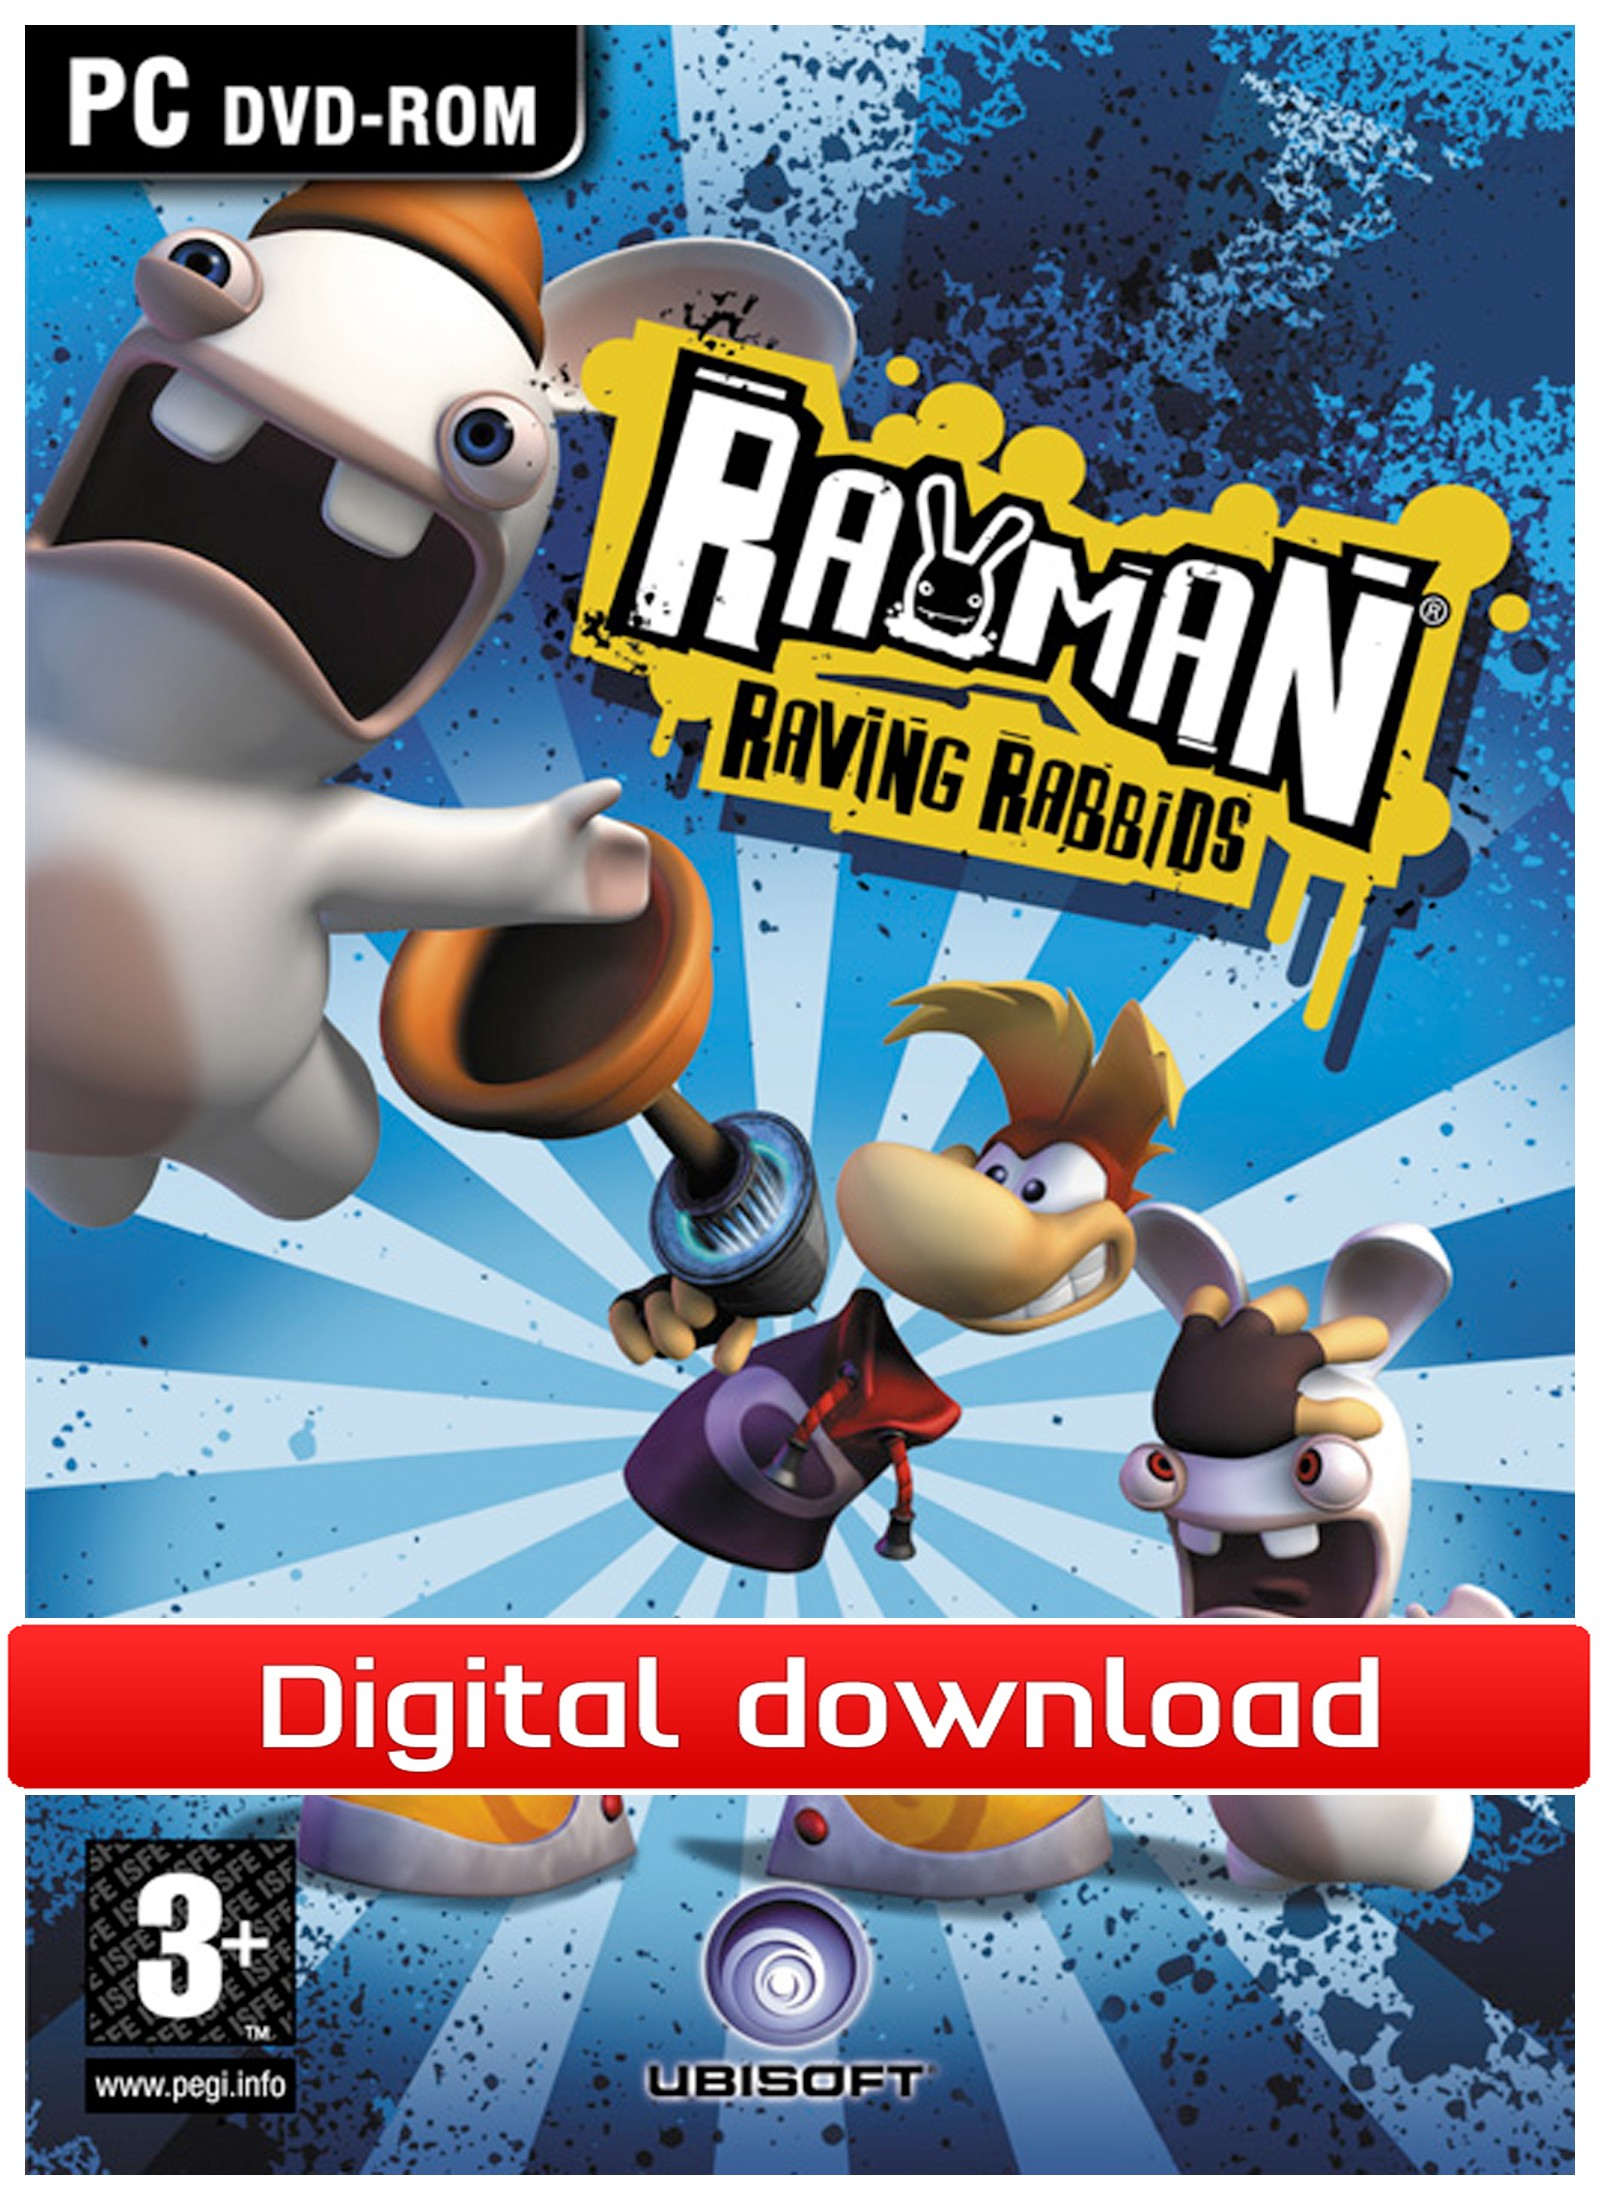 Rayman: Raving Rabbids (PC nedlastning) PCDD22558